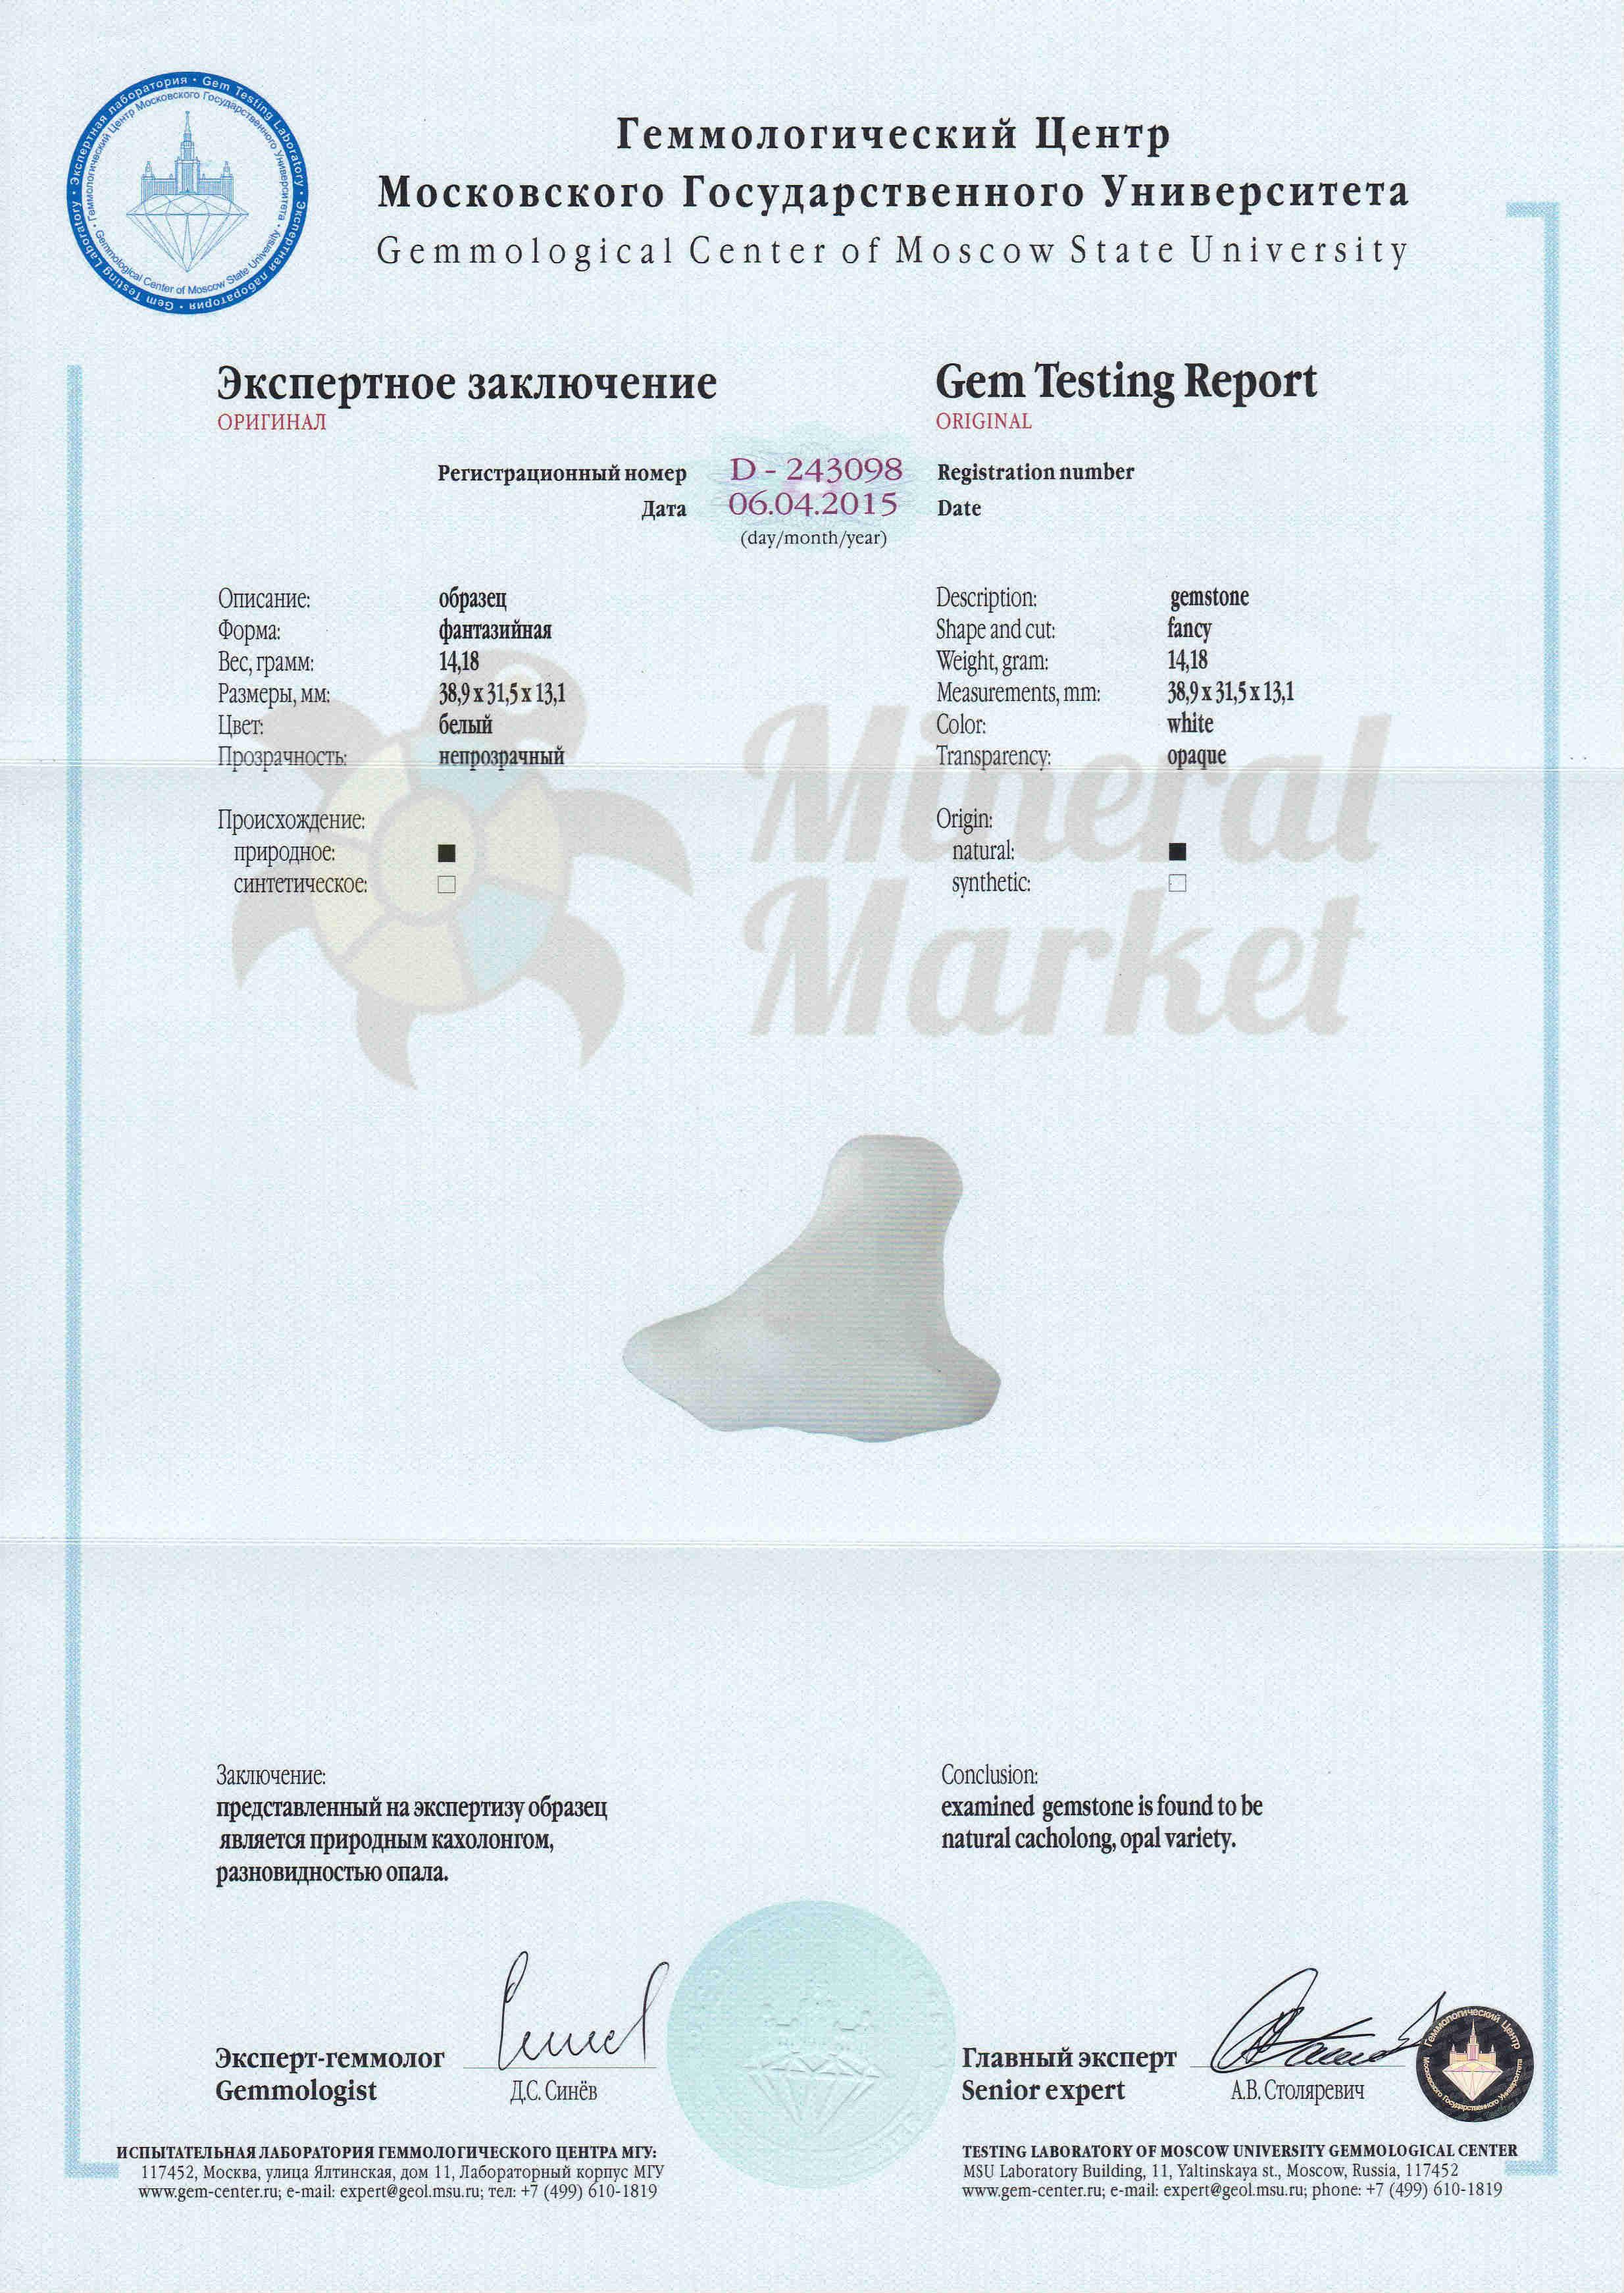 http://mineralmarket.ru/img/certificate/56.jpg